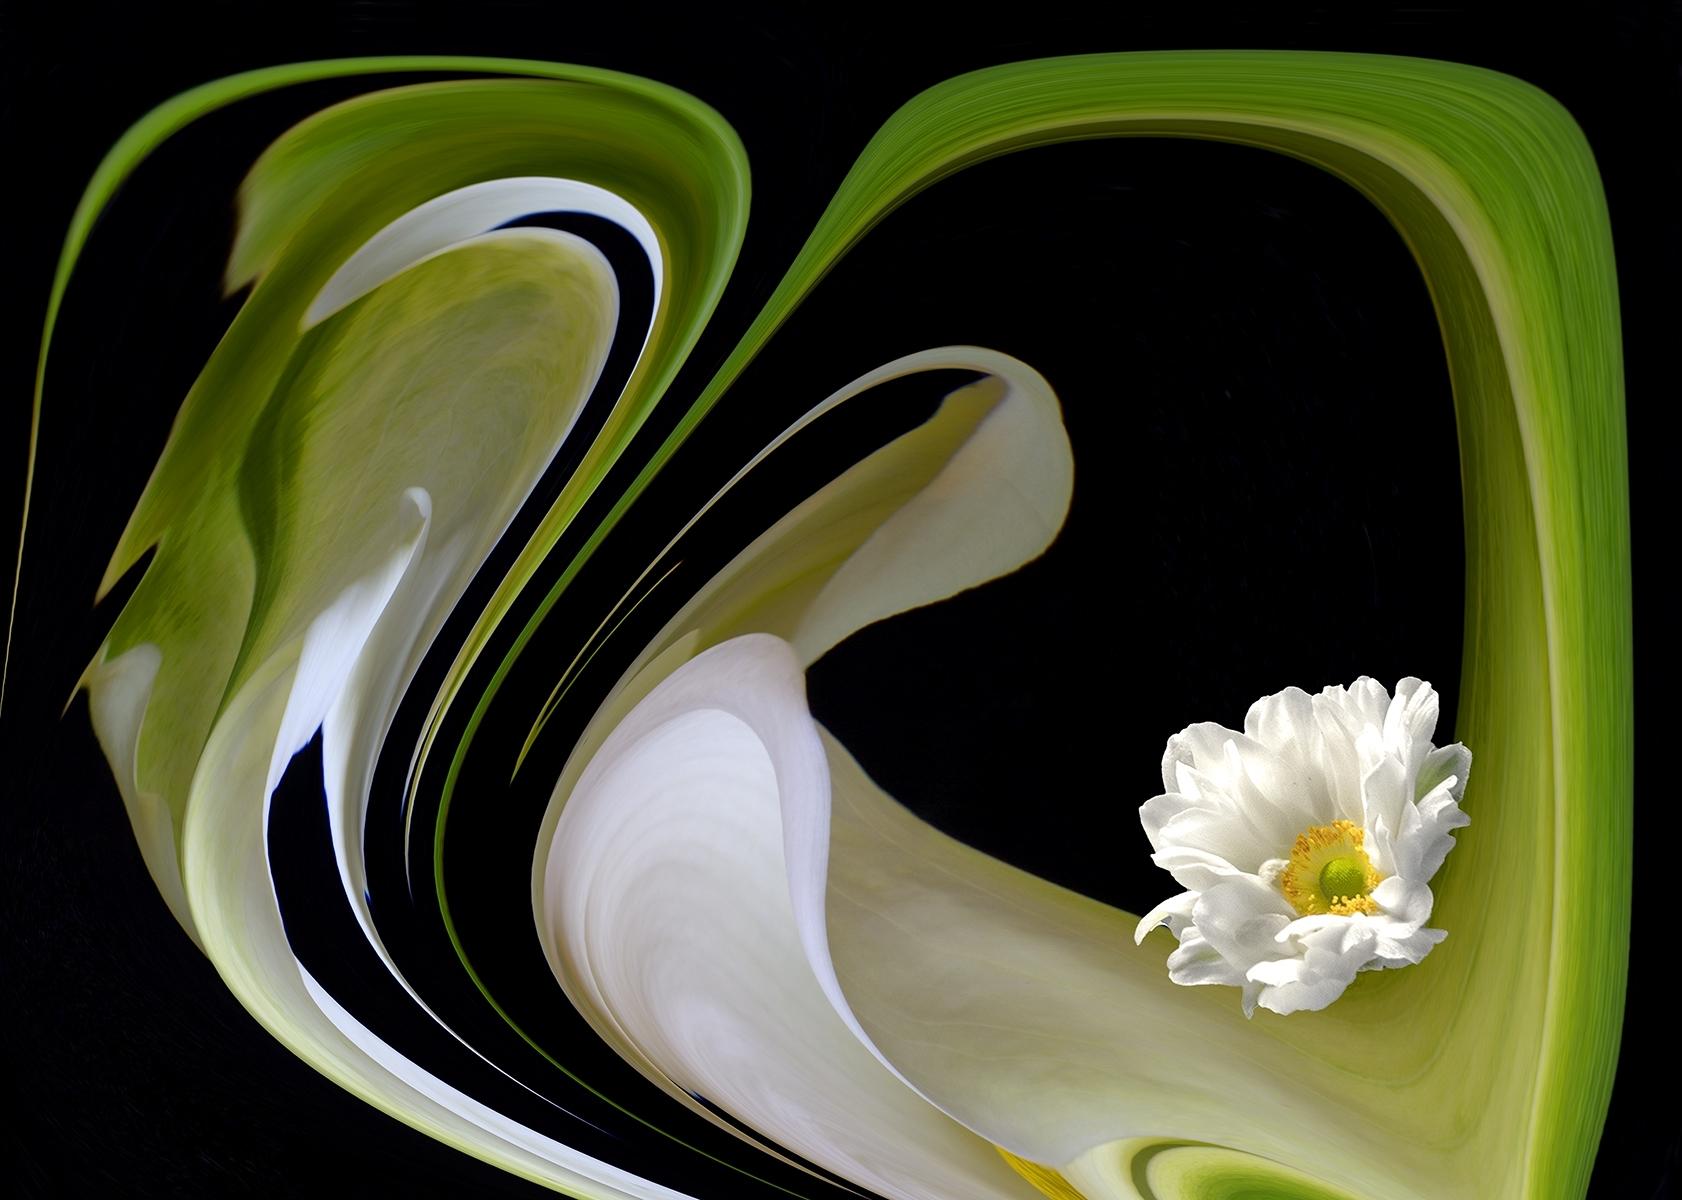 'Calla and Anemone' (CB 1 Place) by Kazuko Hamano - SC